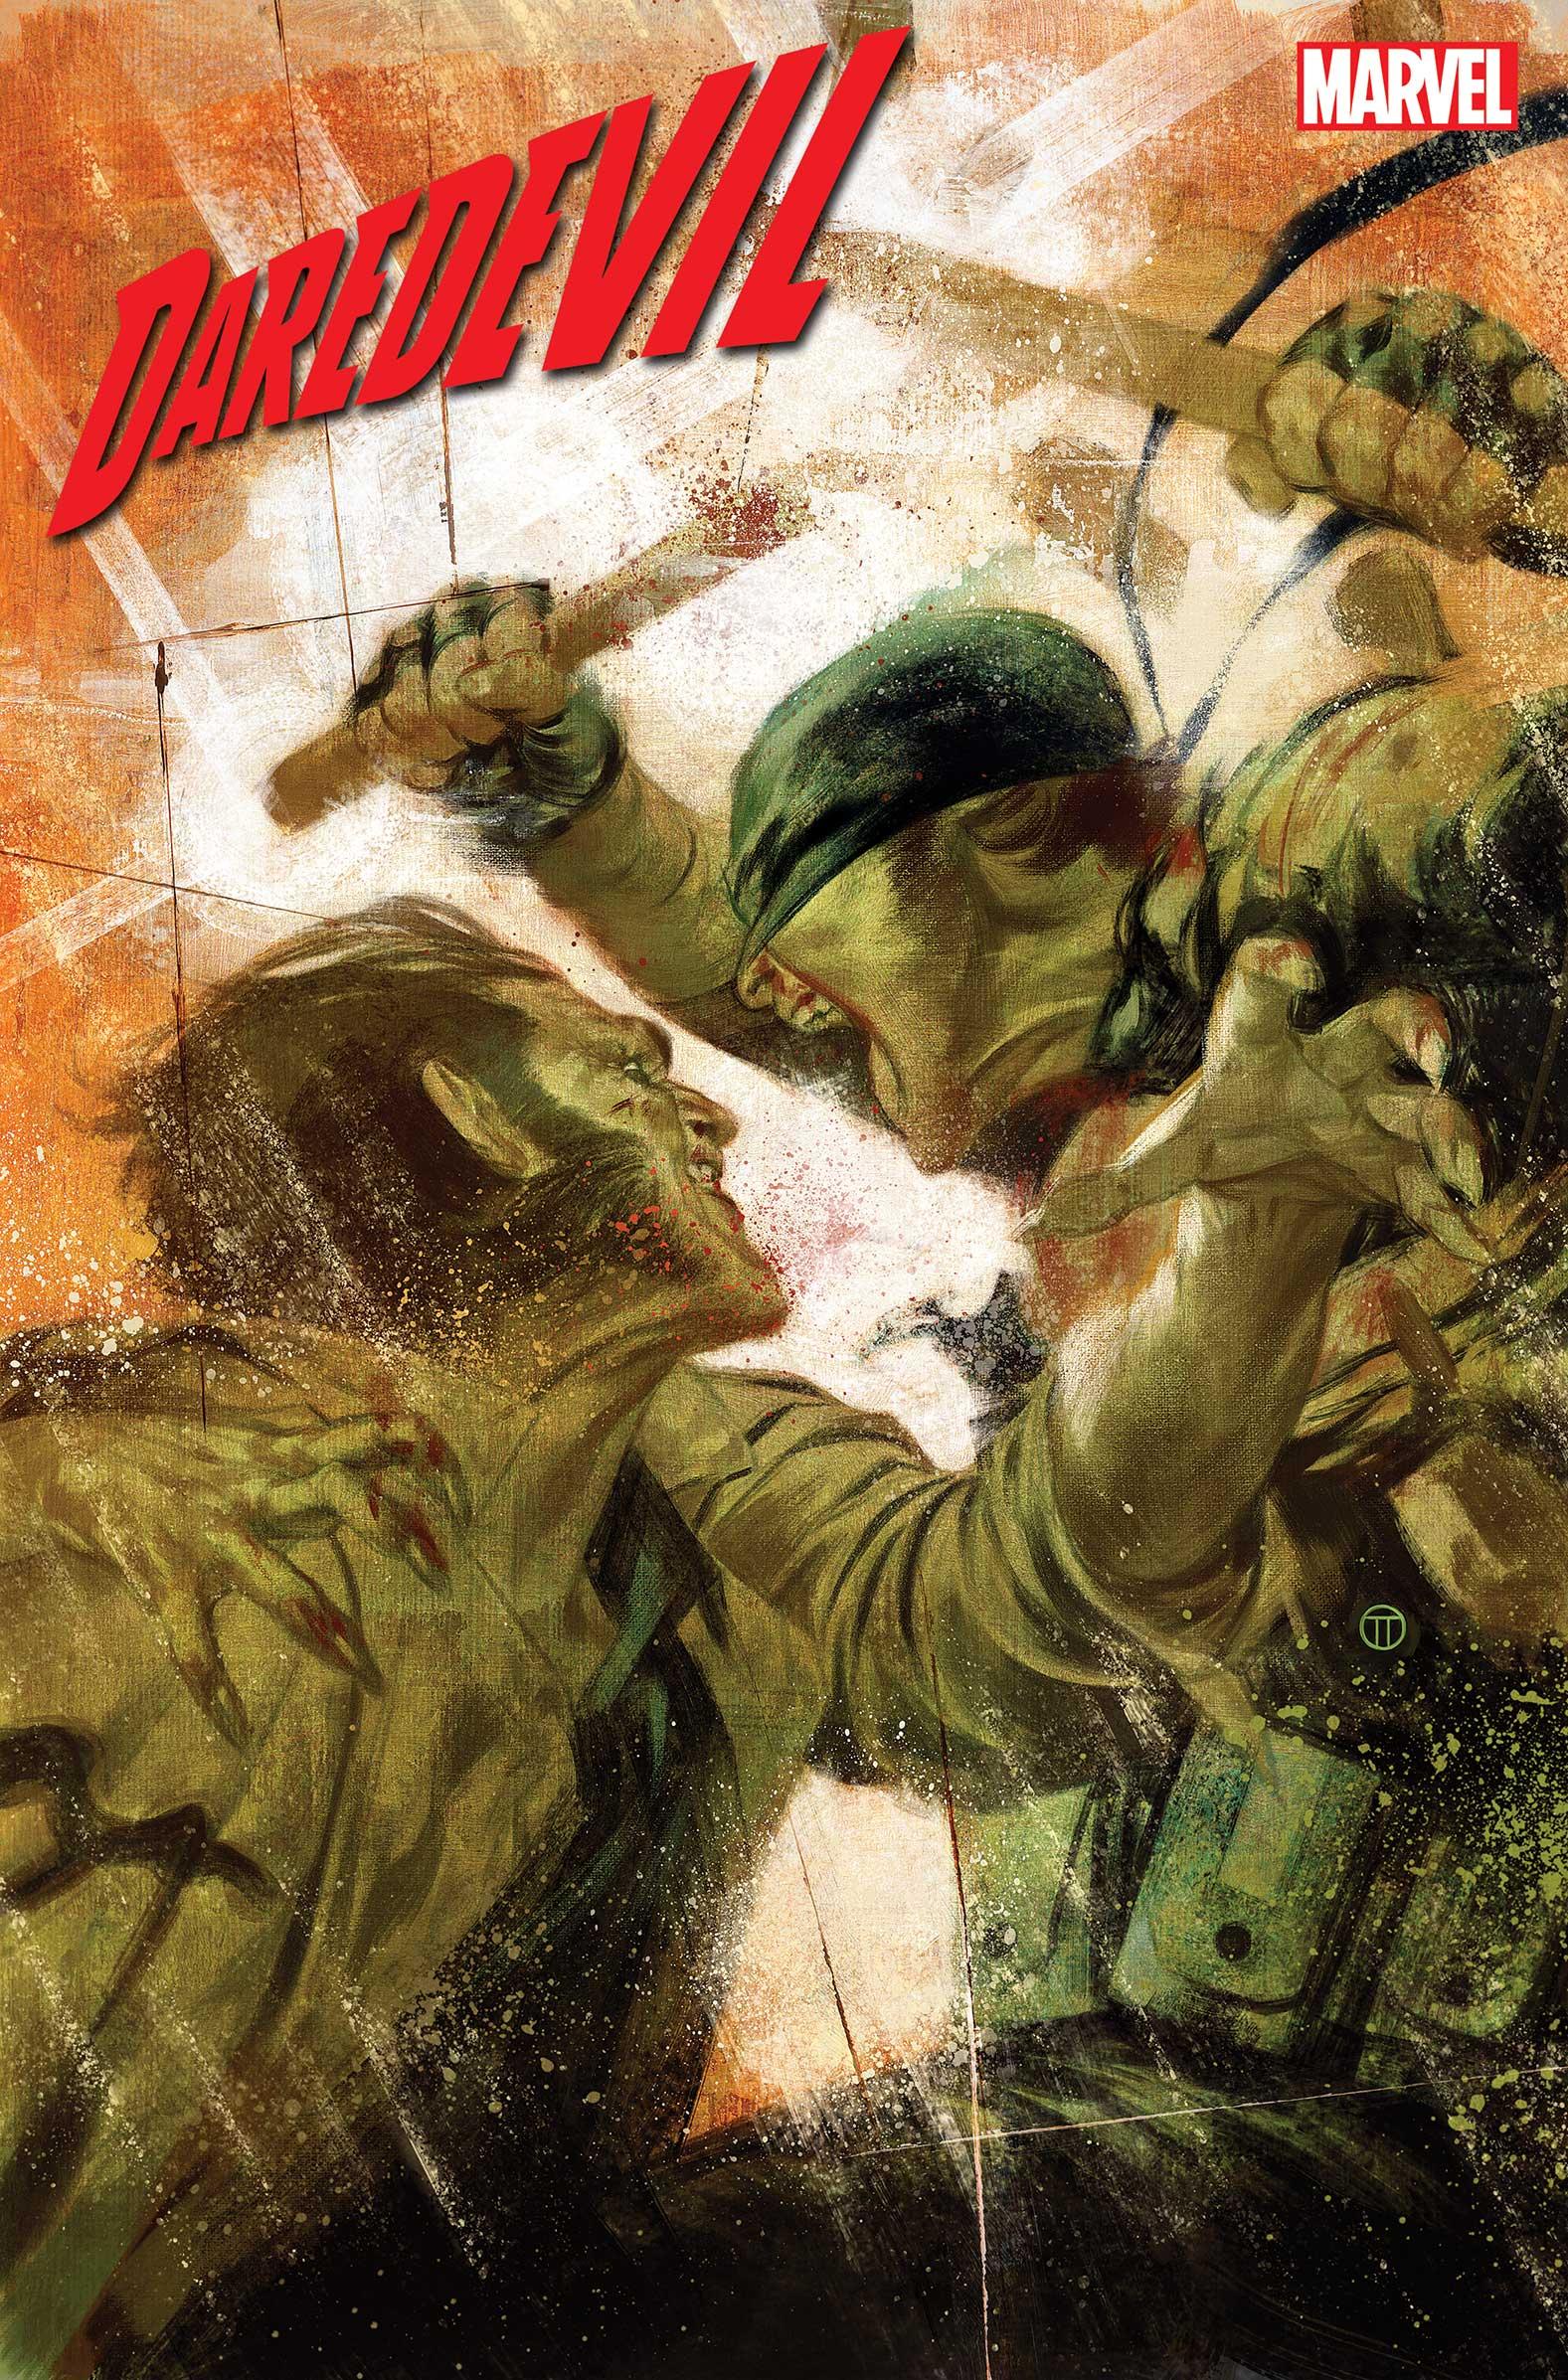 Image result for Daredevil #18